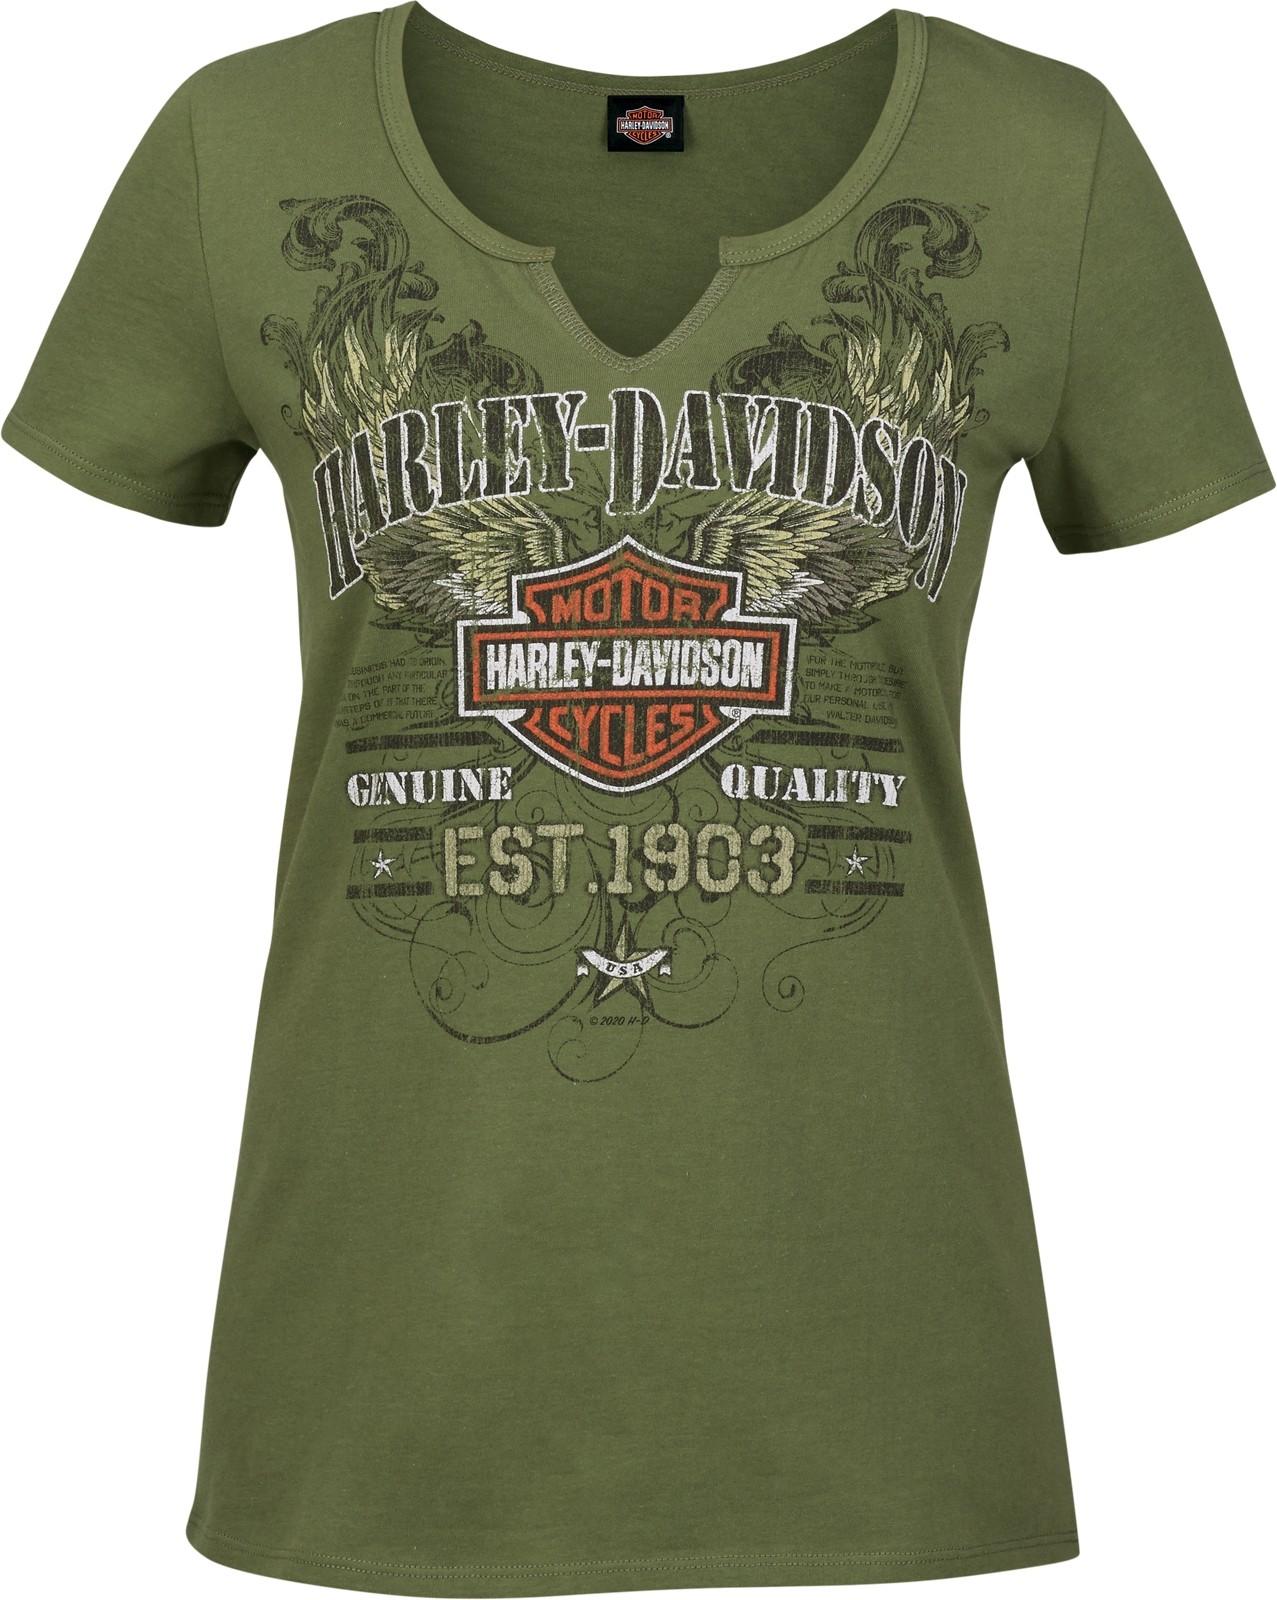 Harley-Davidson Military - Women's Olive Green V-Neck Notched Graphic T-Shirt - RAF Mildenhall | Scrappy